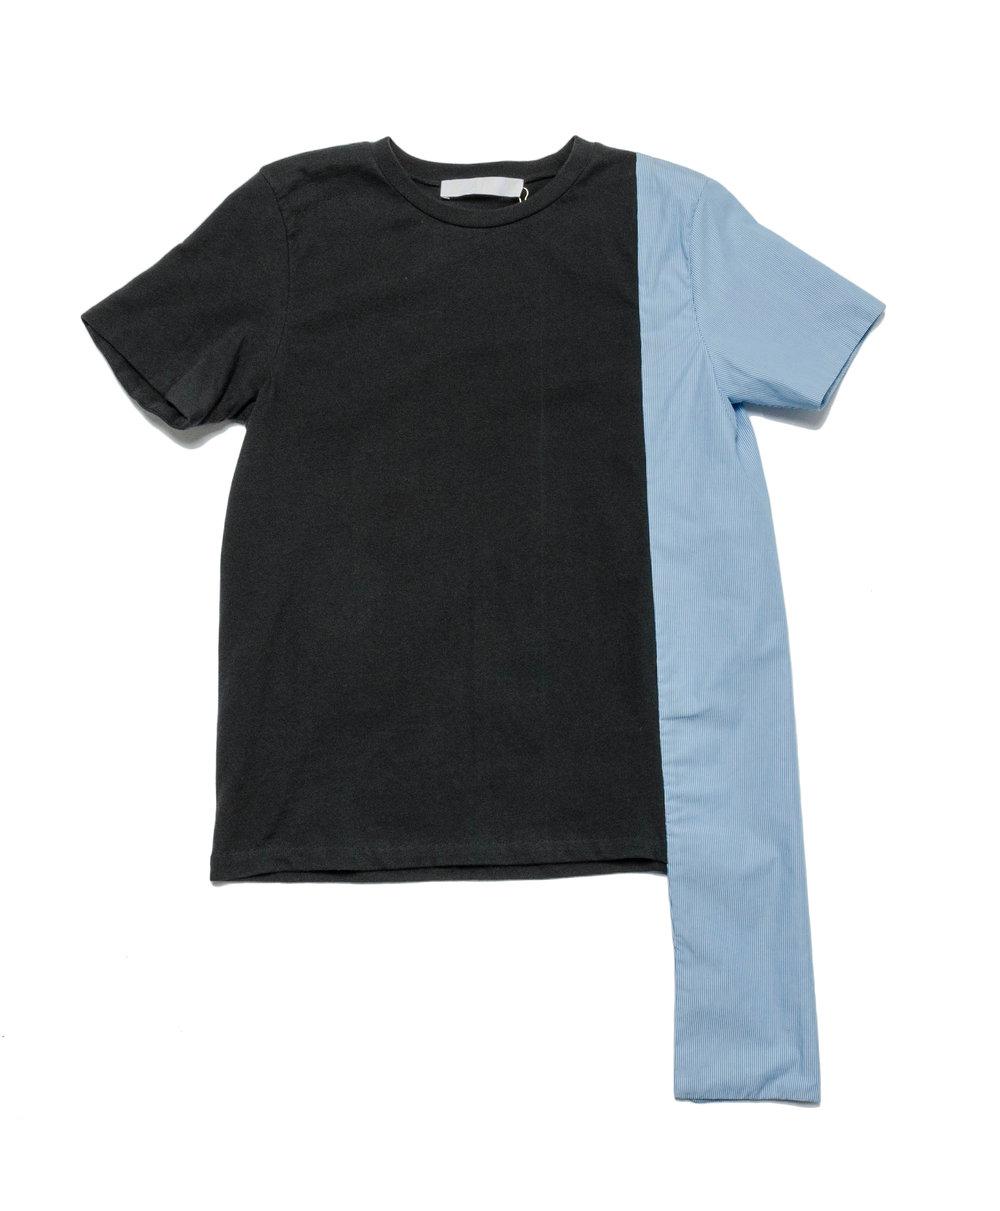 black, blue stripe cotton knit tee with cotton woven stripe detail